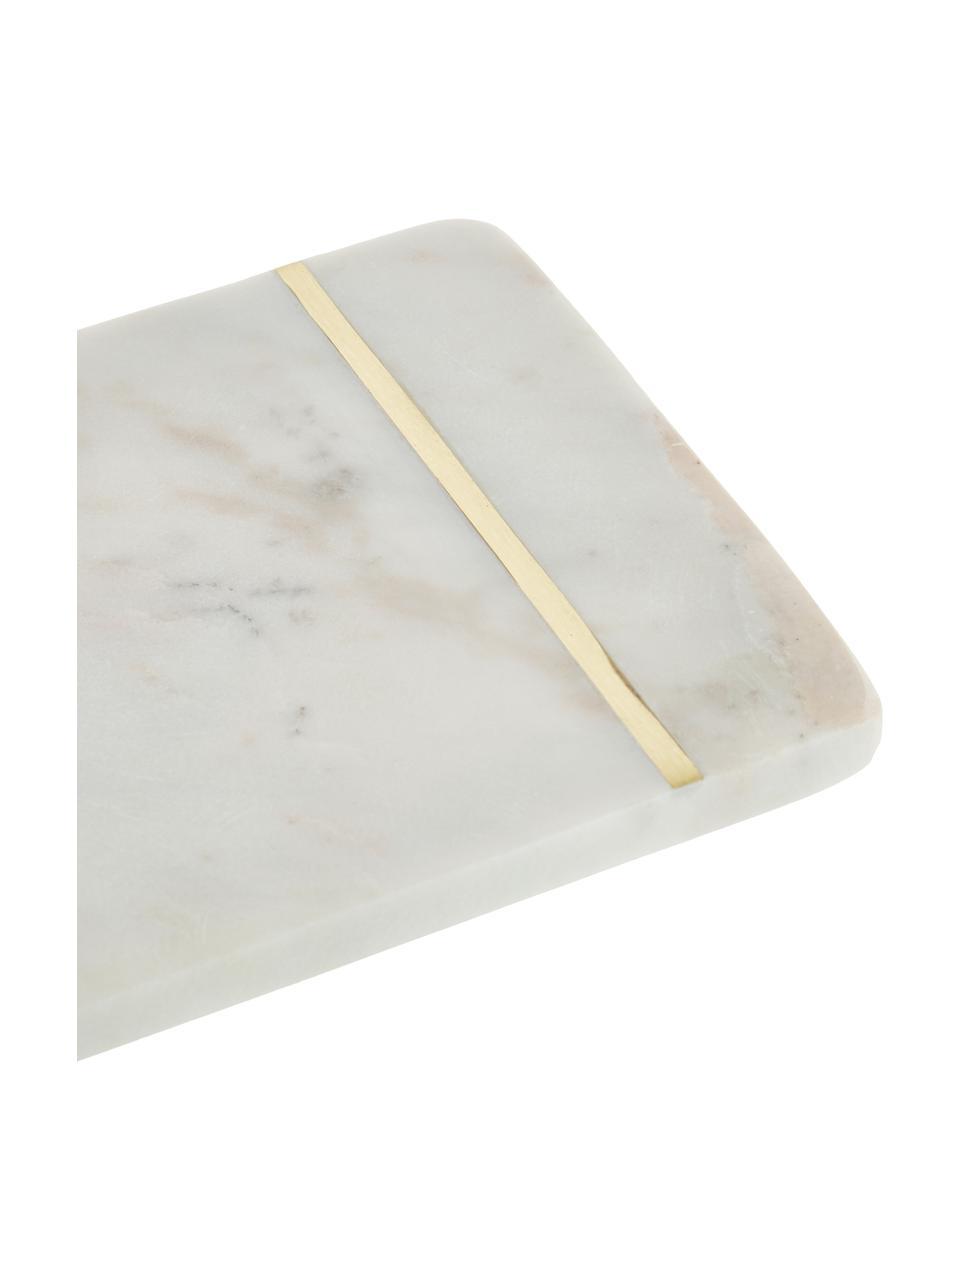 Marmeren snijplank Strip, L 37 x B 15 cm, Ophanglus: leer, Wit, goudkleurig, 15 x 37 cm